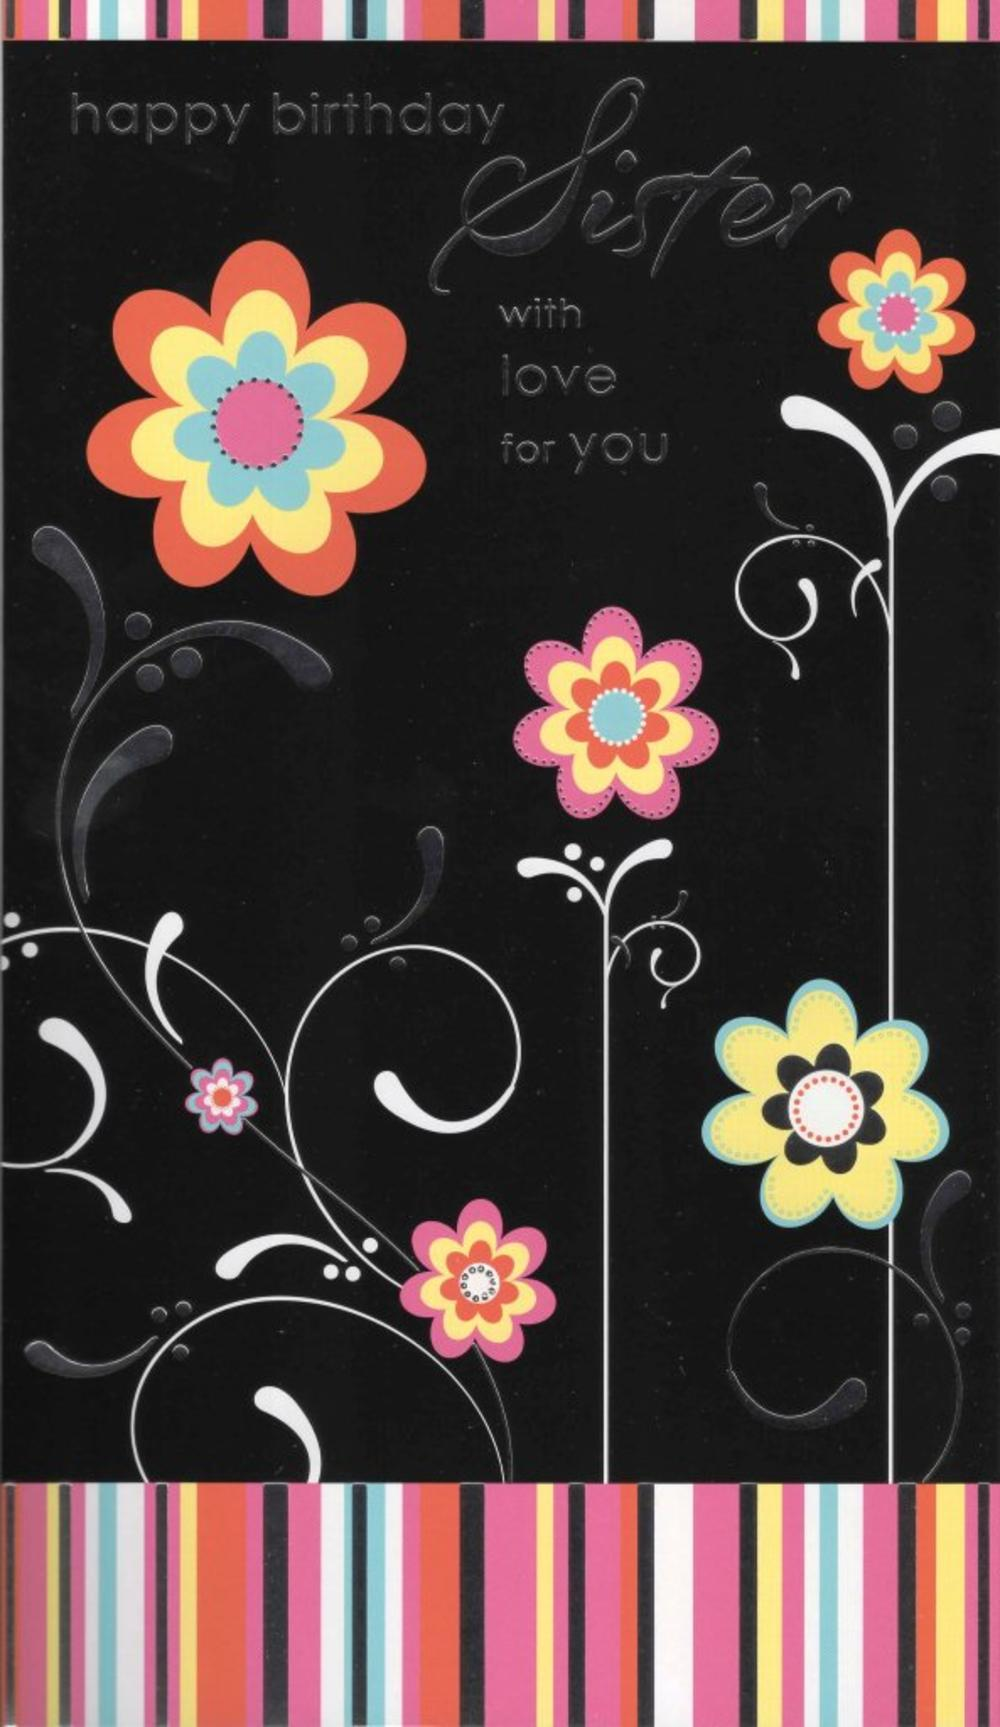 Large Happy Birthday Sister Card